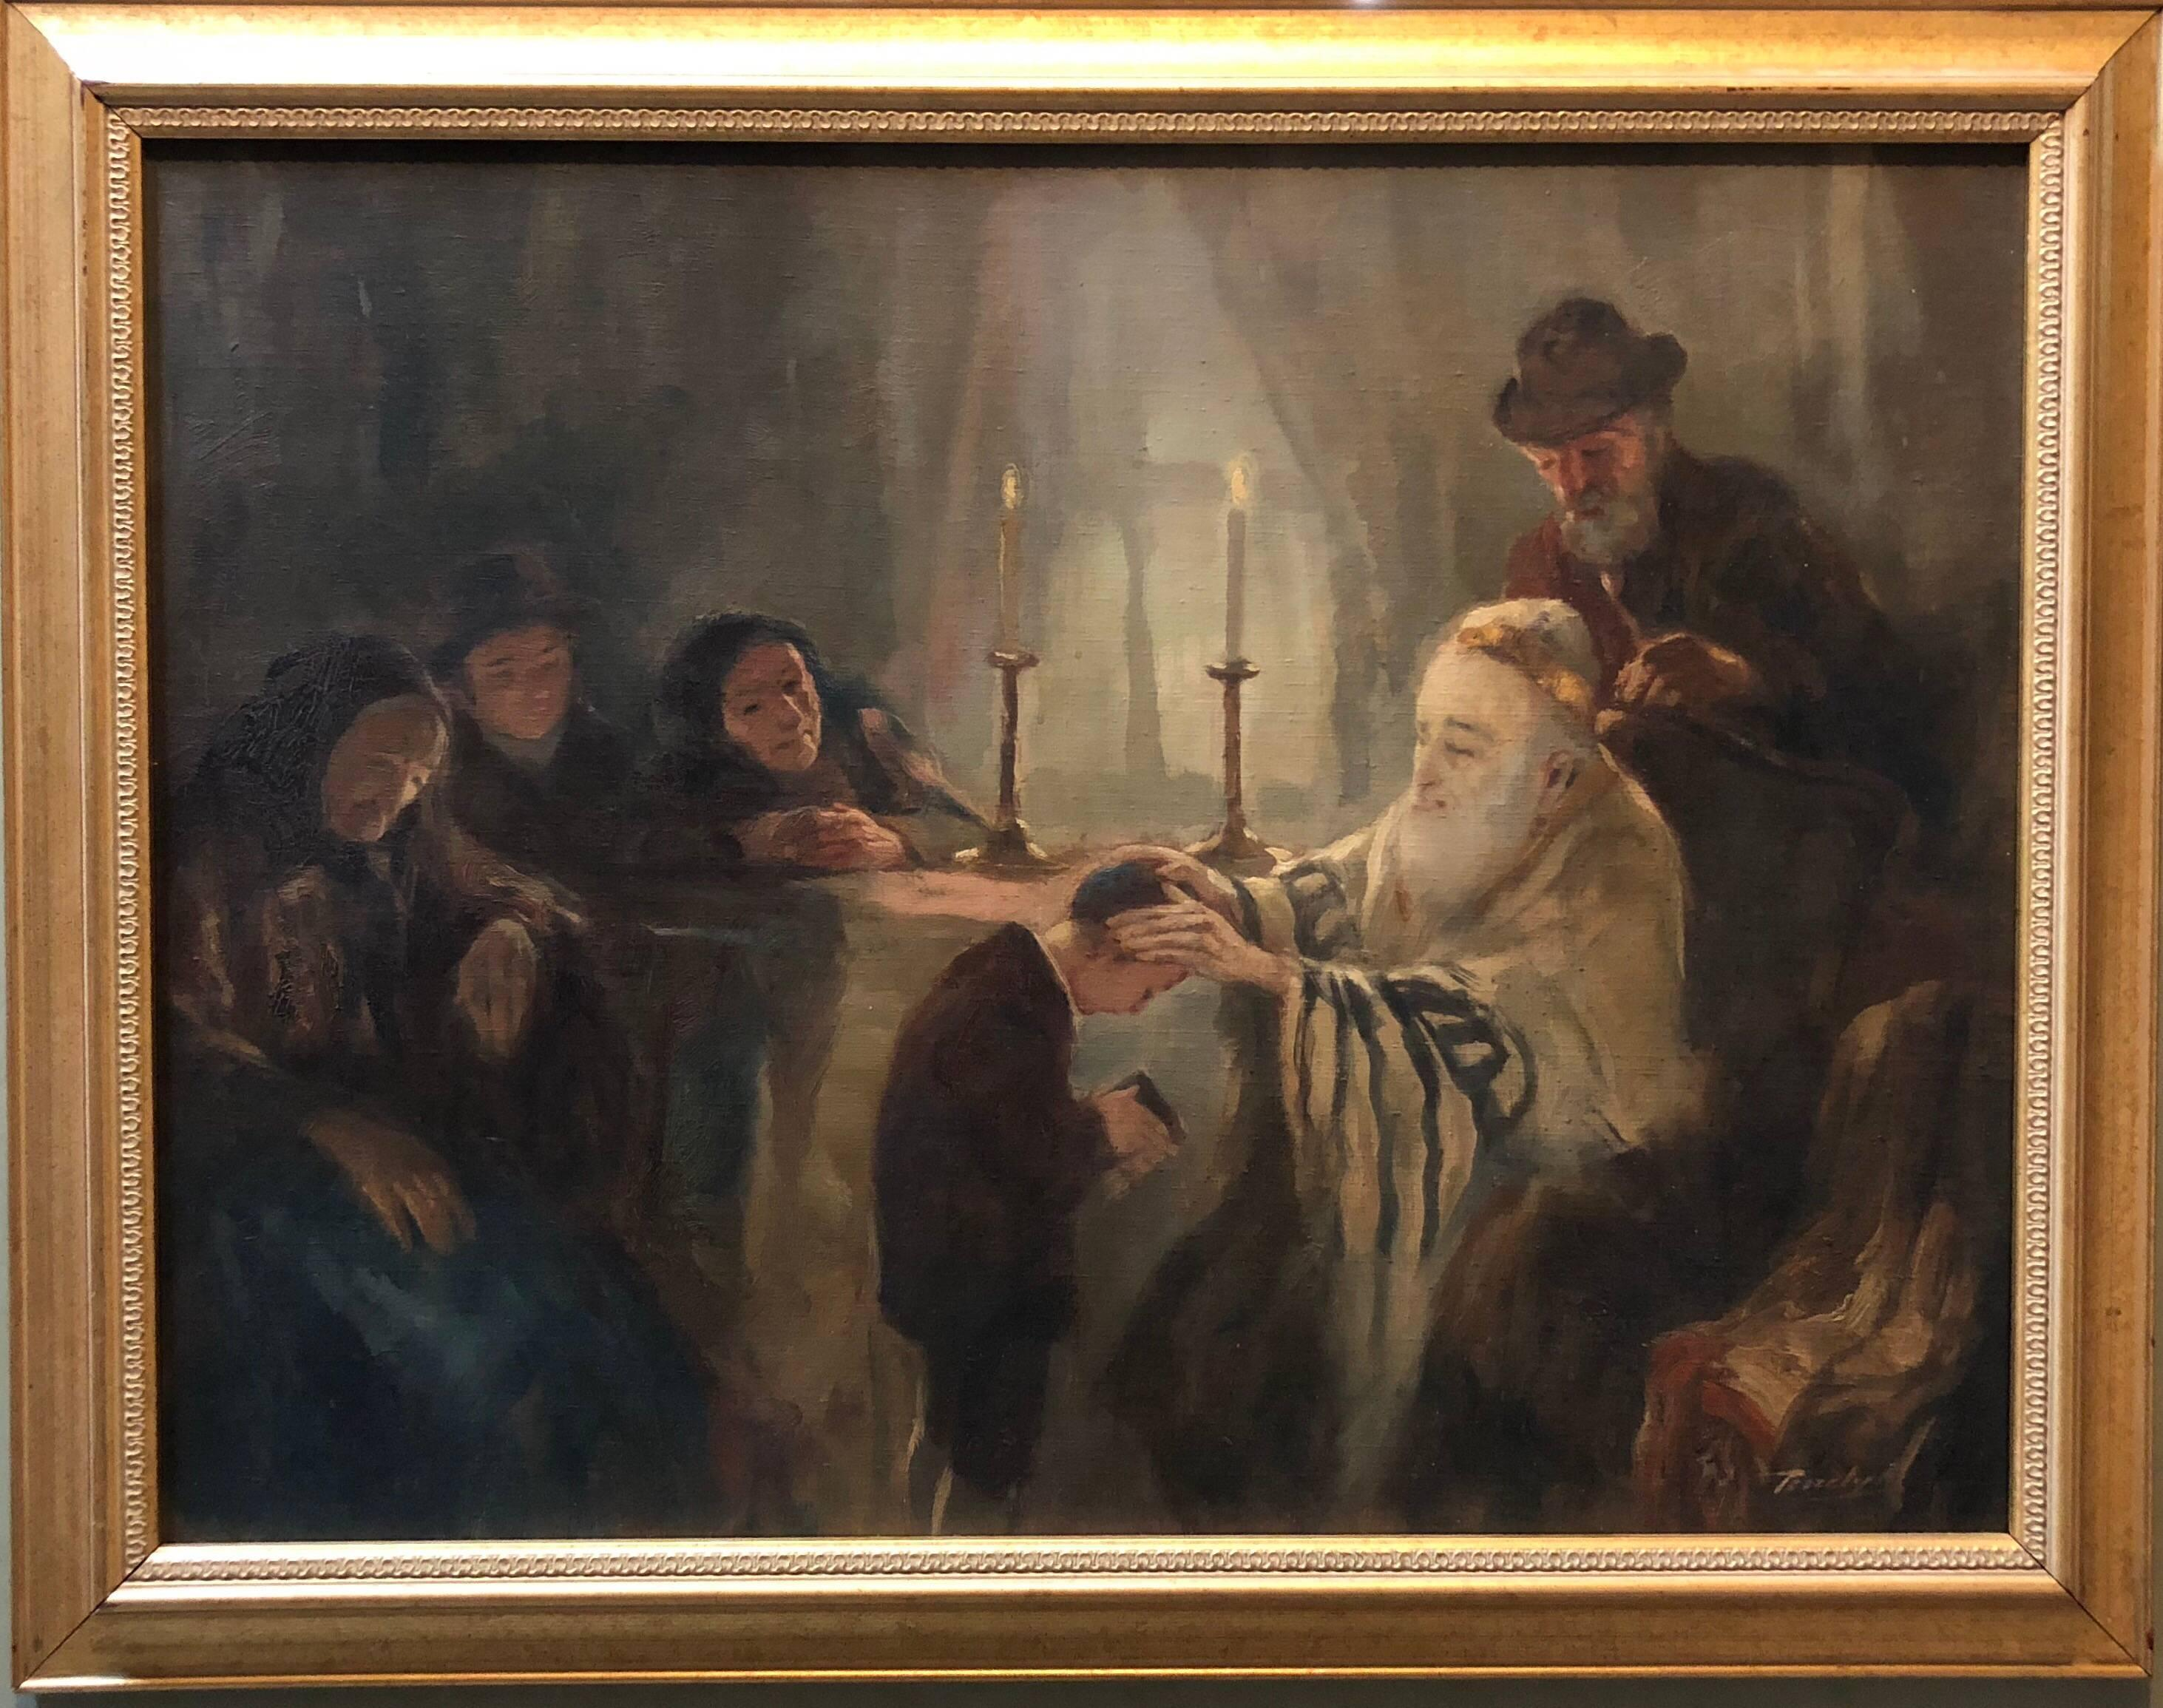 Blessing of the Tzadik (Rebbe) Rare Hungarian Judaica Oil Painting